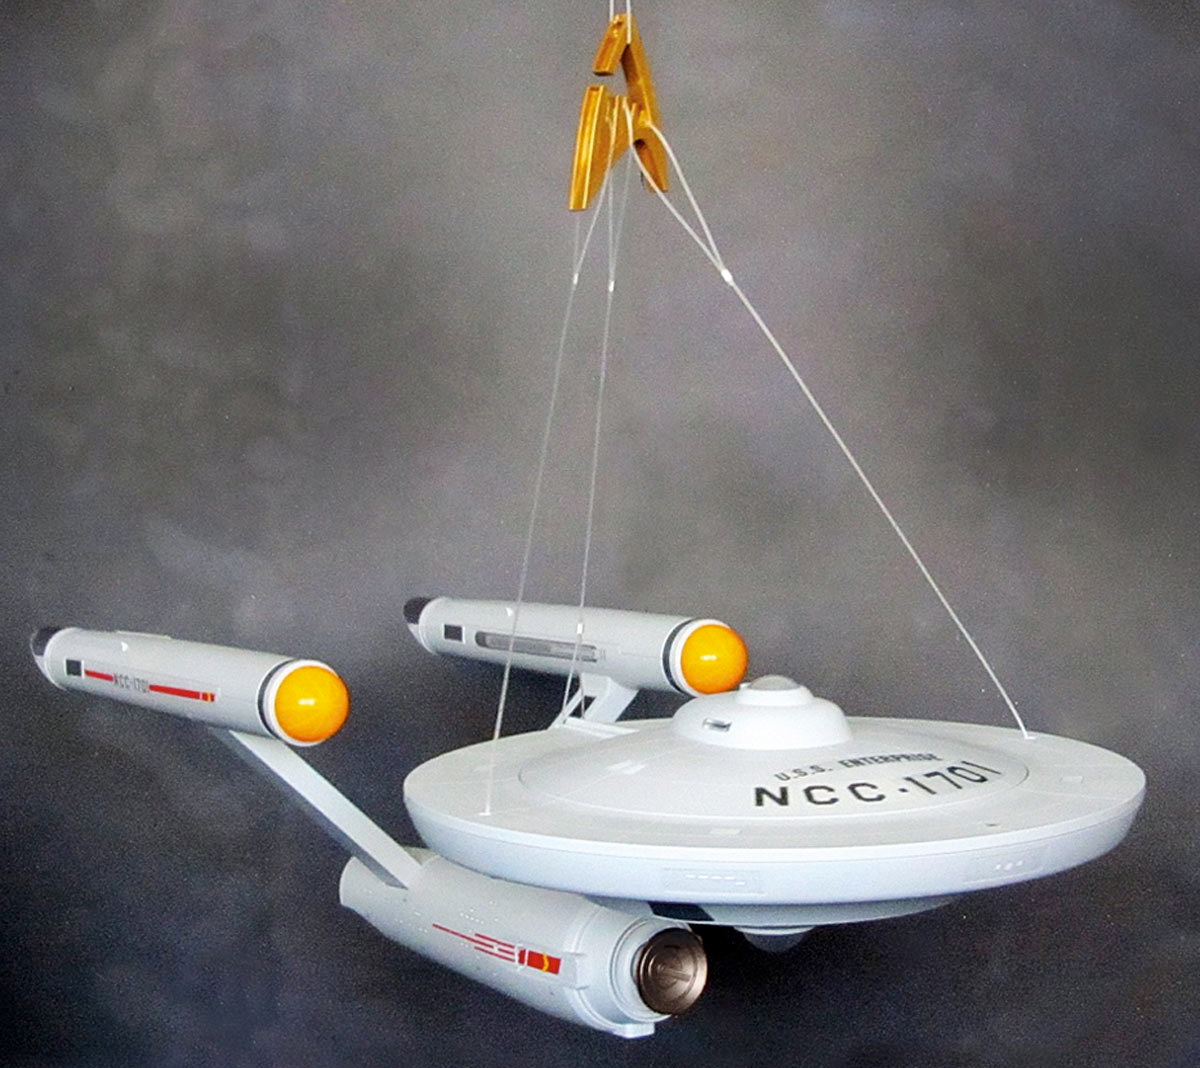 Playmobil Star Trek U.S.S. Enterprise NCC-1701 Playset